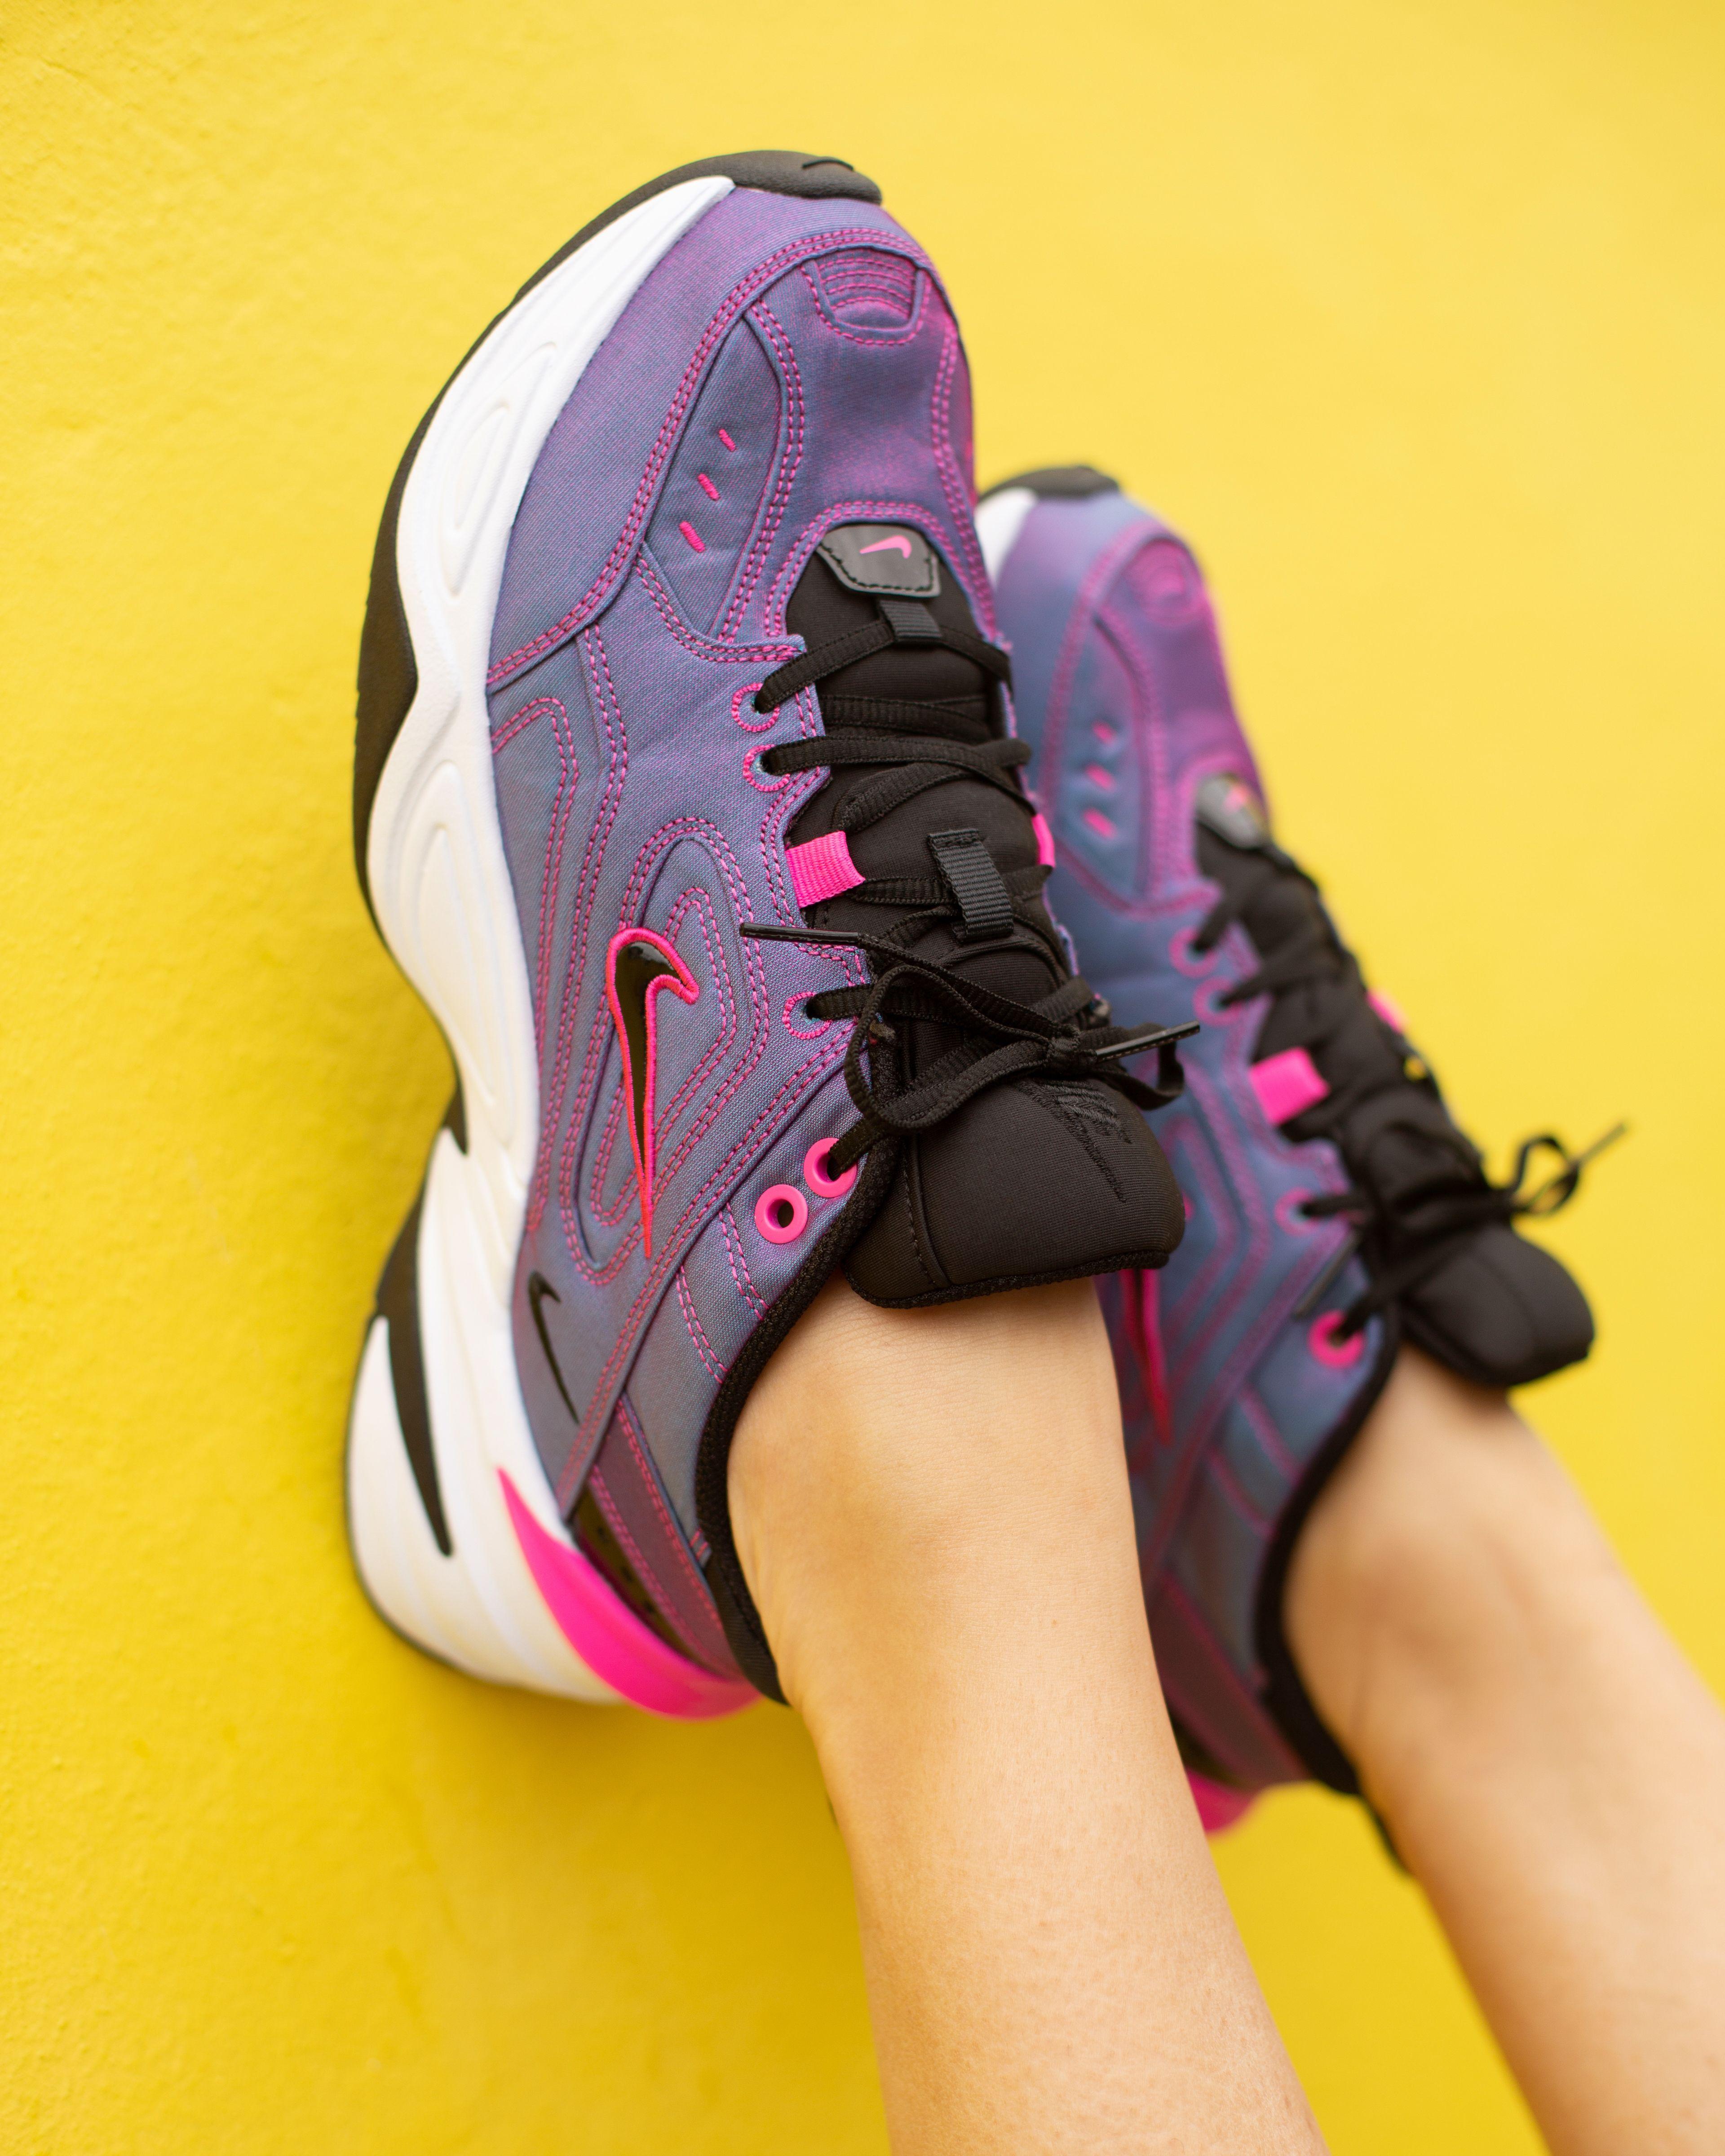 ASOS Nike M2K Tekno trainers coming